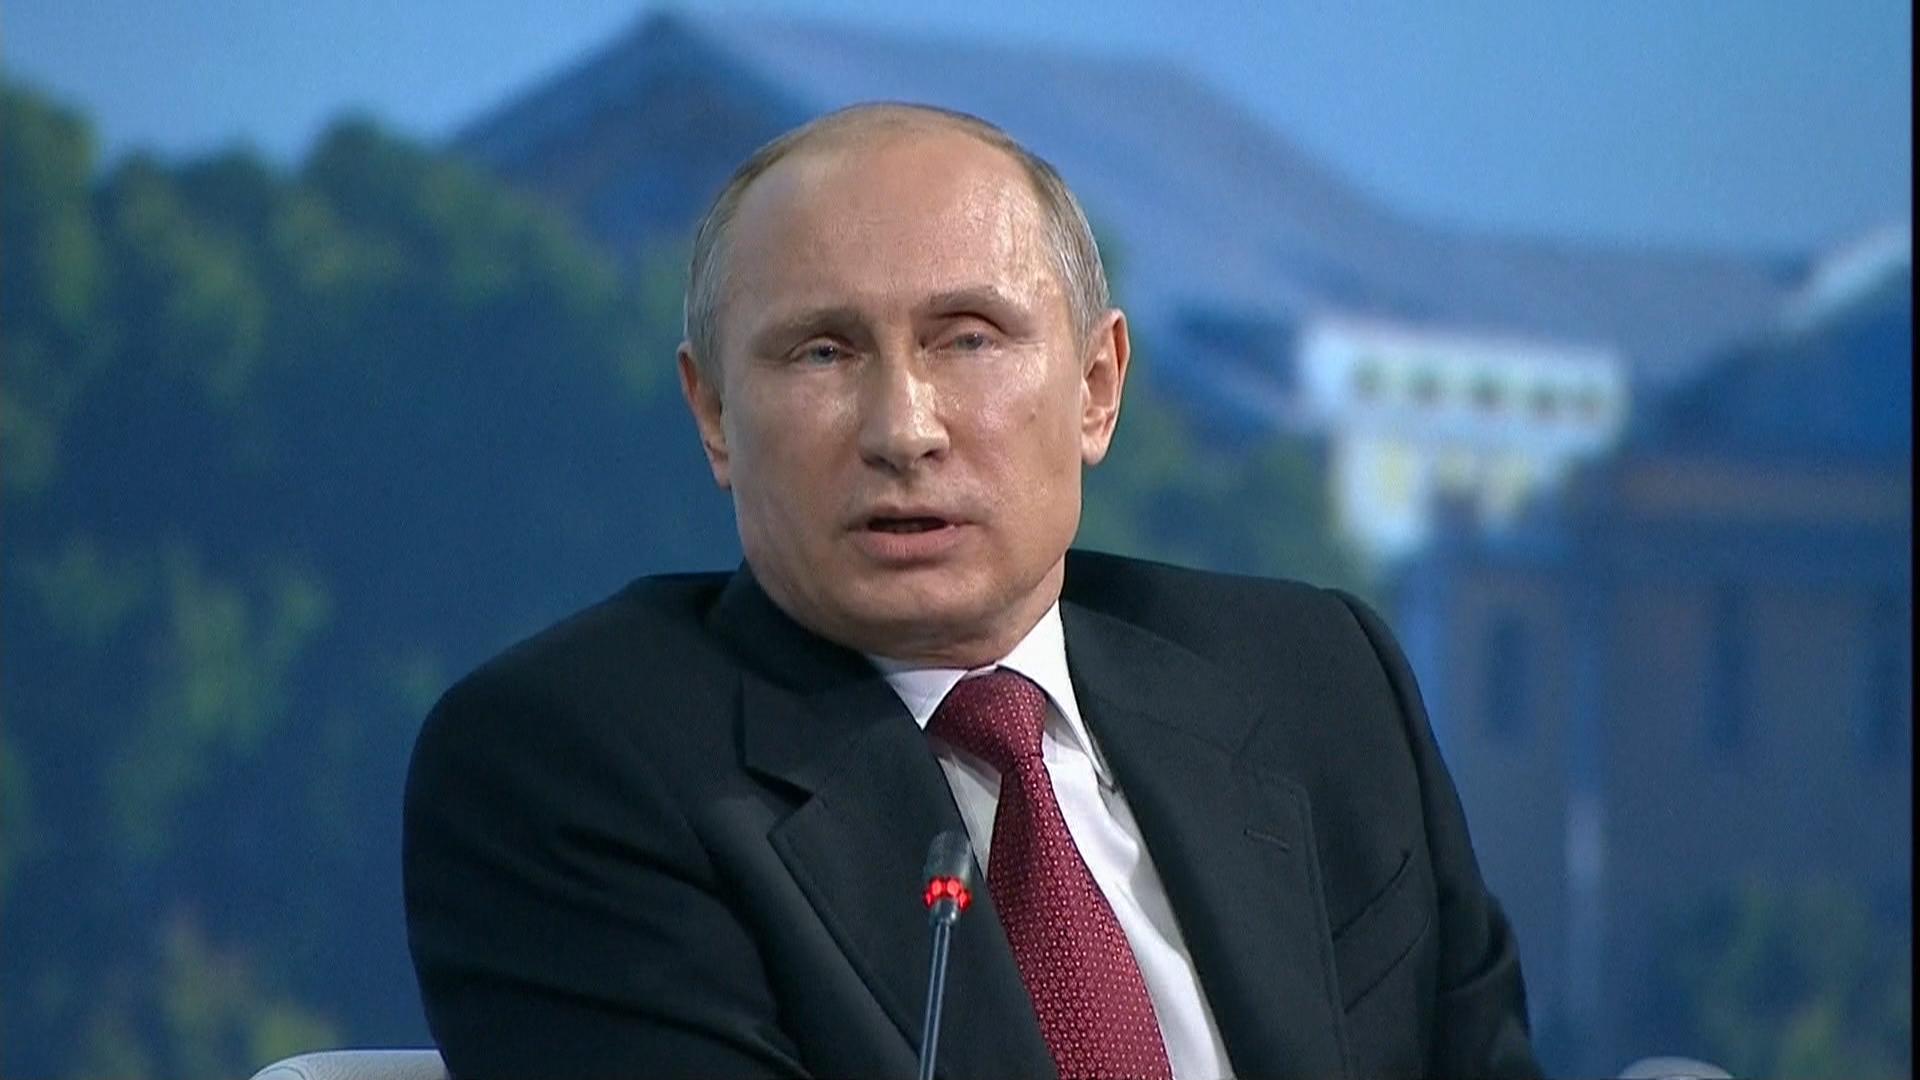 Putin outlines plan for Eurasian union